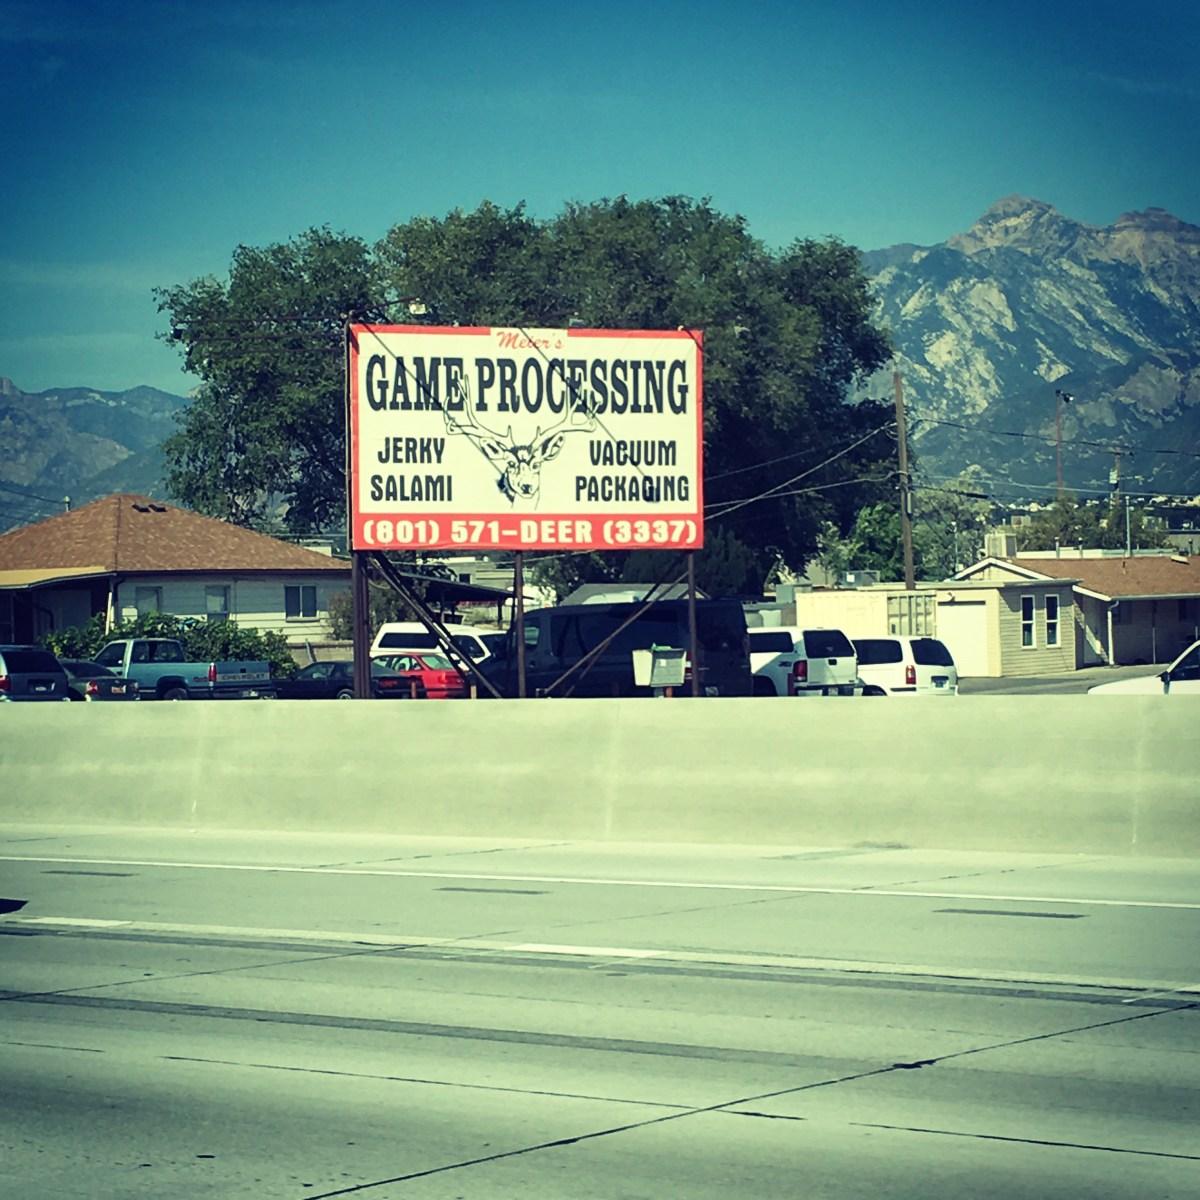 Day 3: Billboards